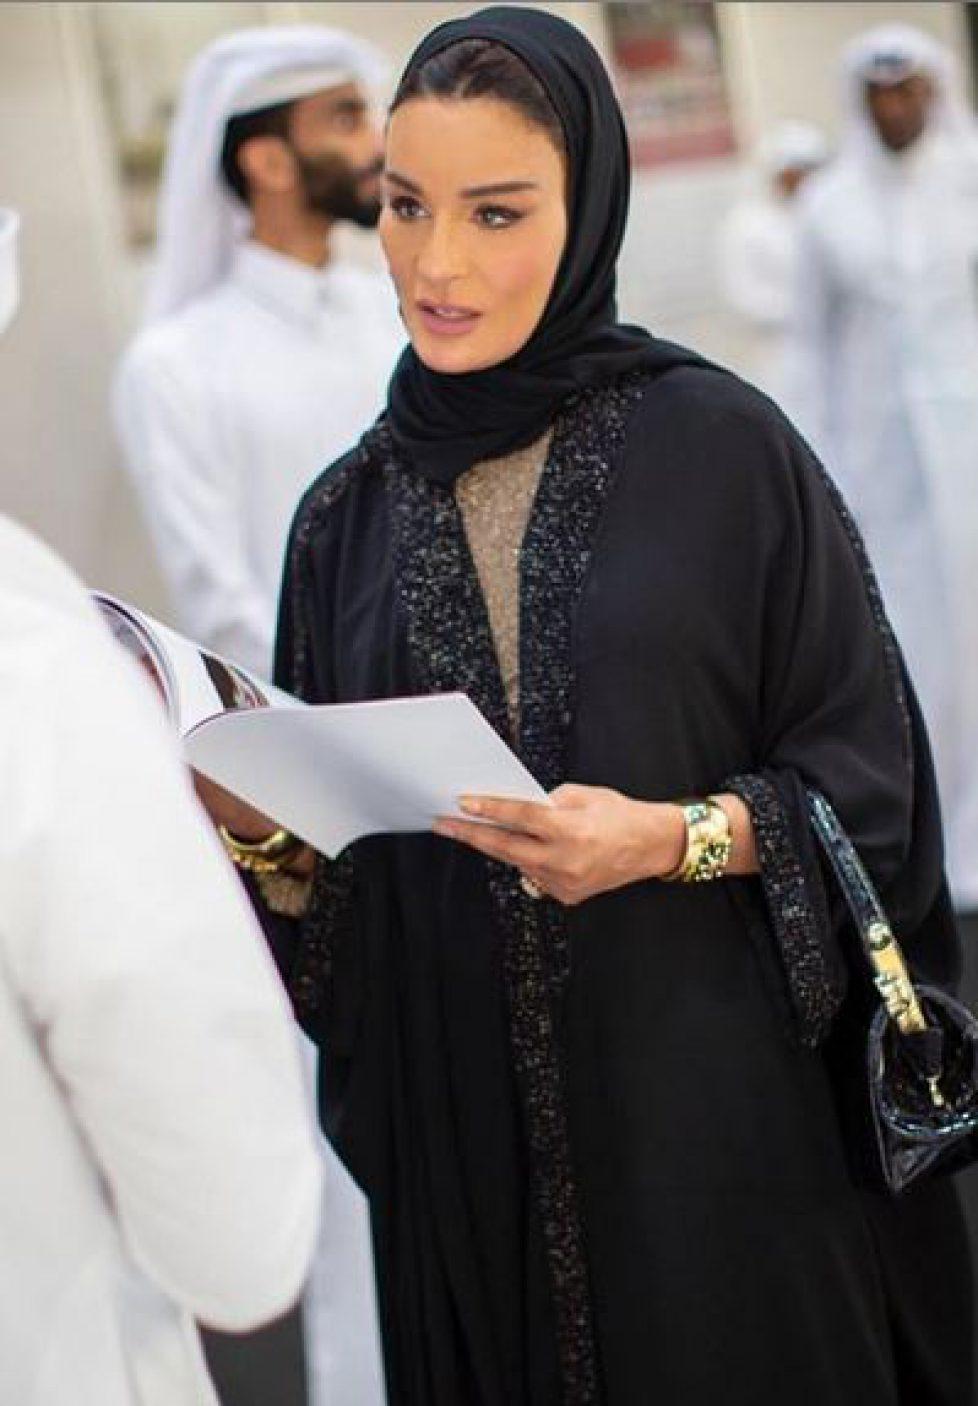 najah qatari festival